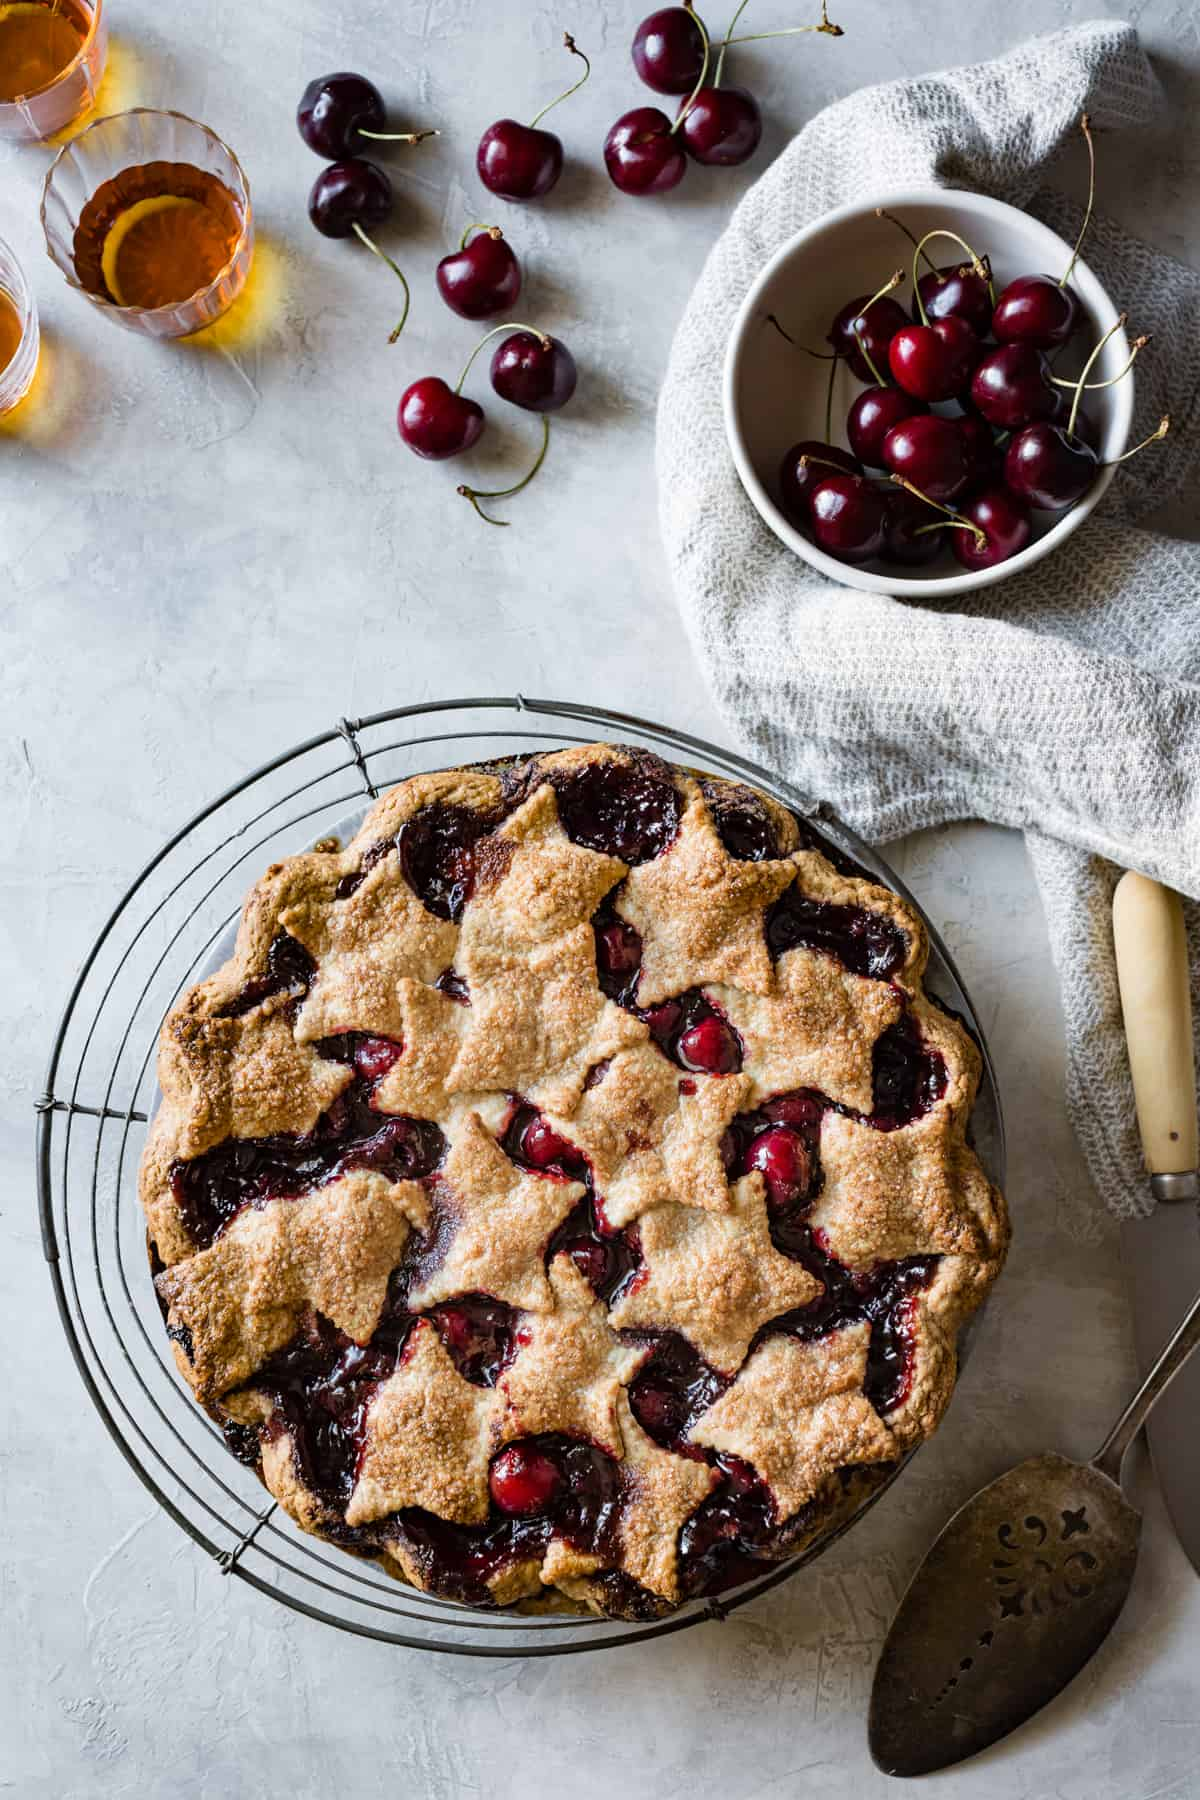 Spiced Bourbon Cherry Pie {gluten-free} with bowl of cherries